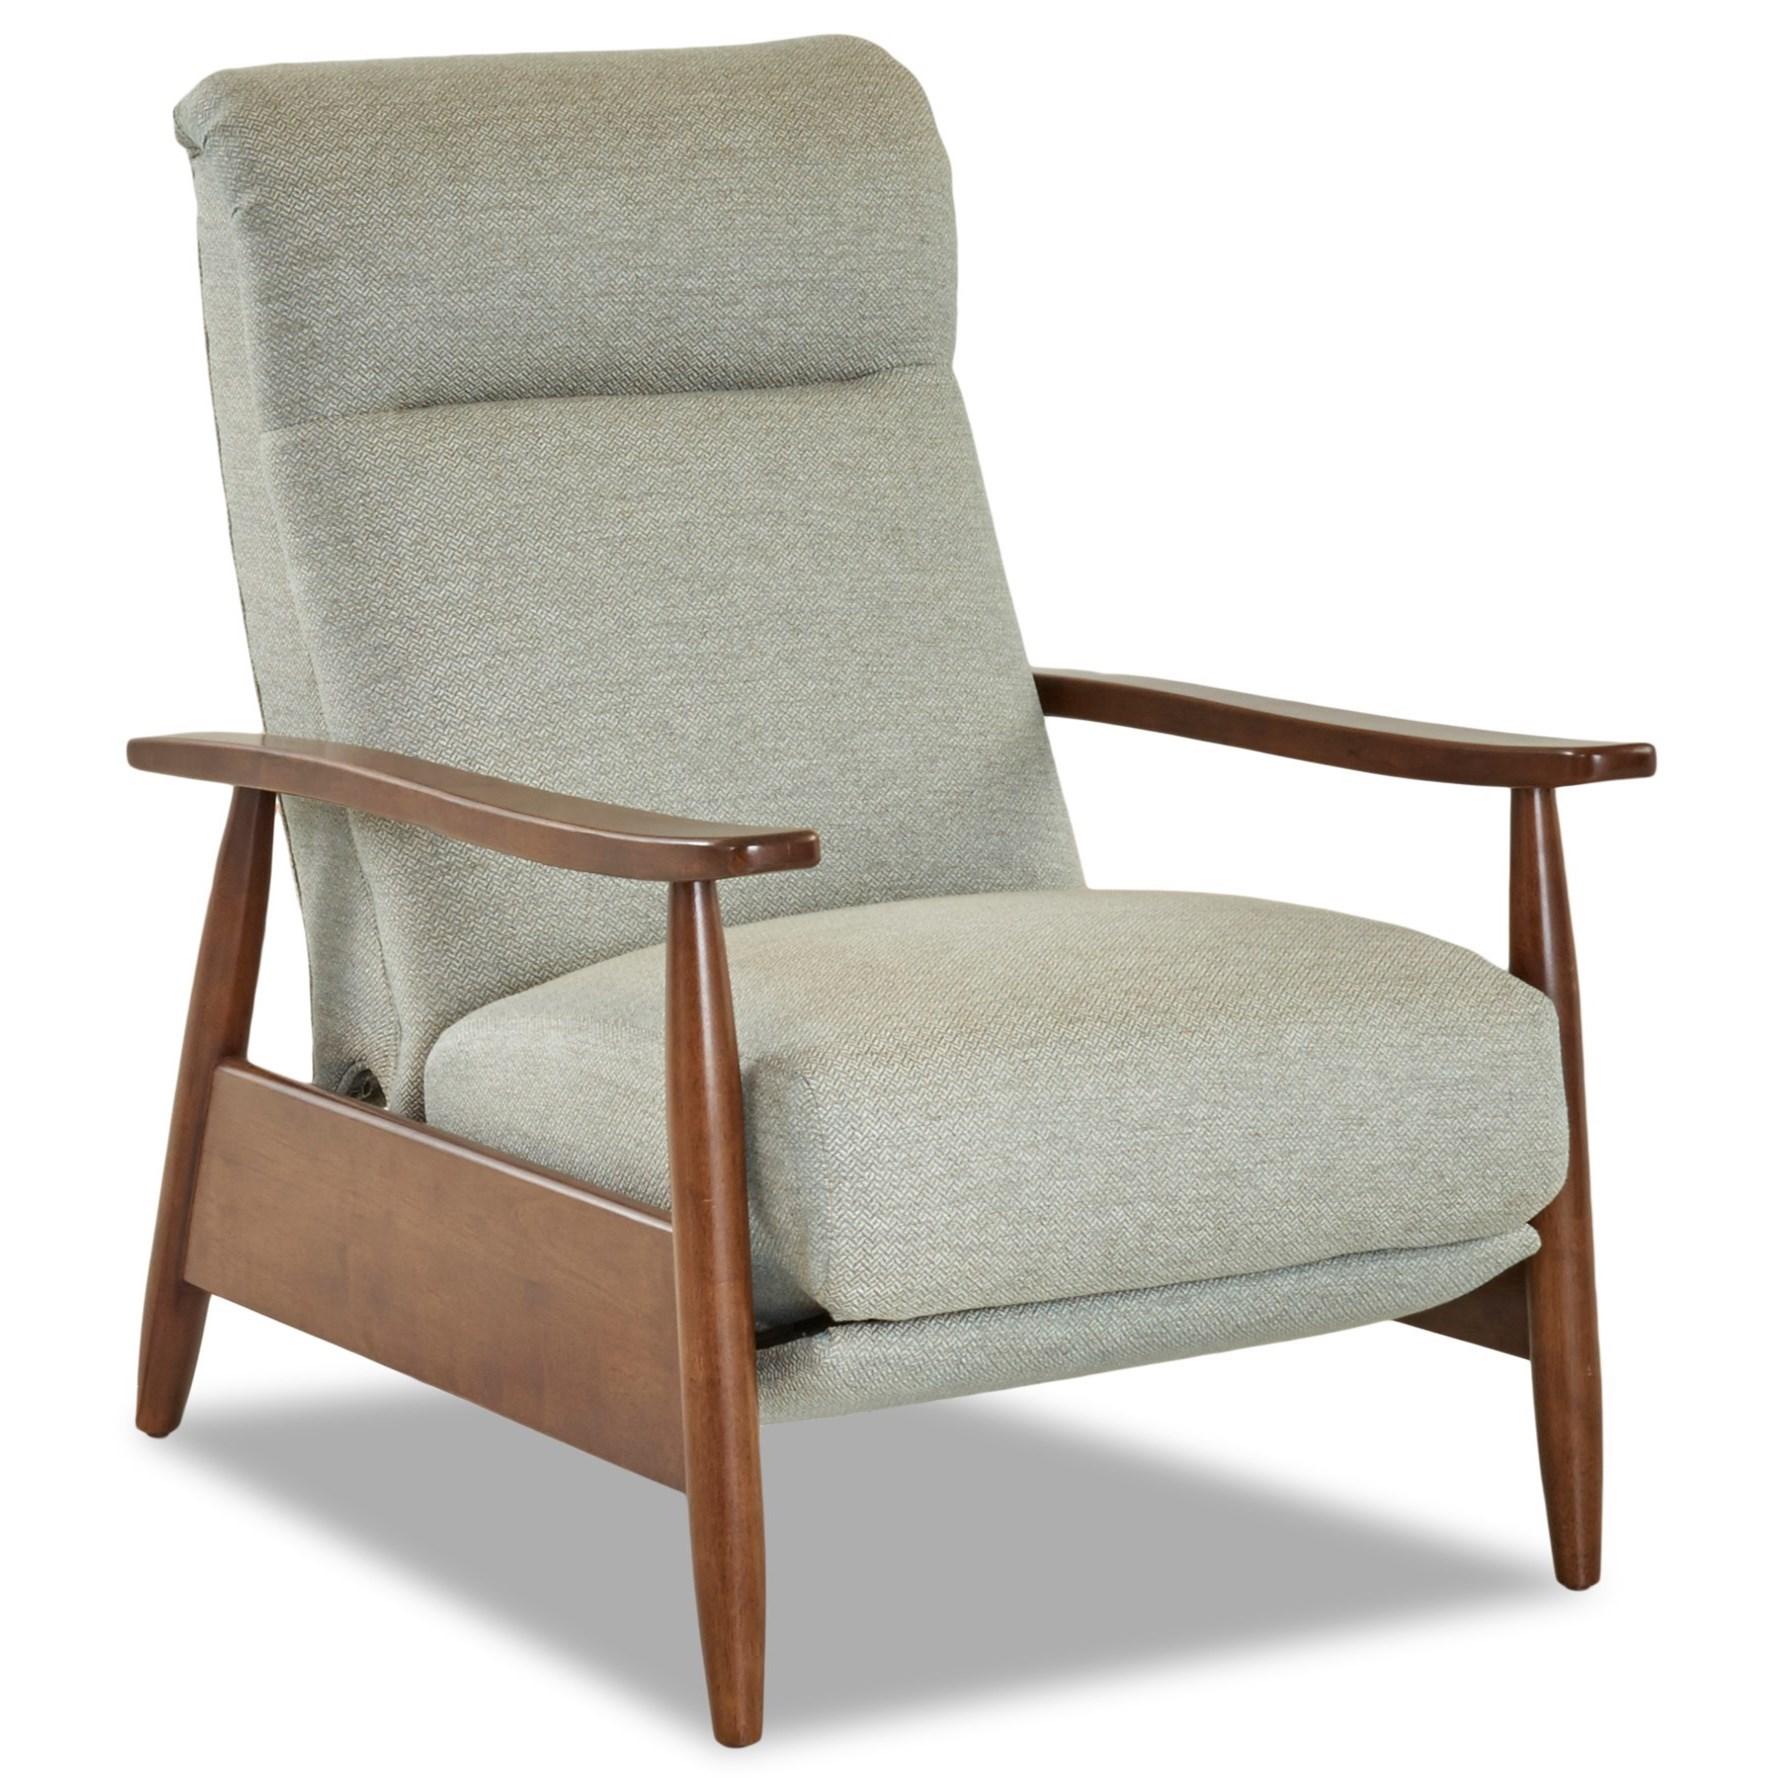 Klaussner Elanor Mid Century Modern Push Back Recliner Value City Furniture High Leg Recliners